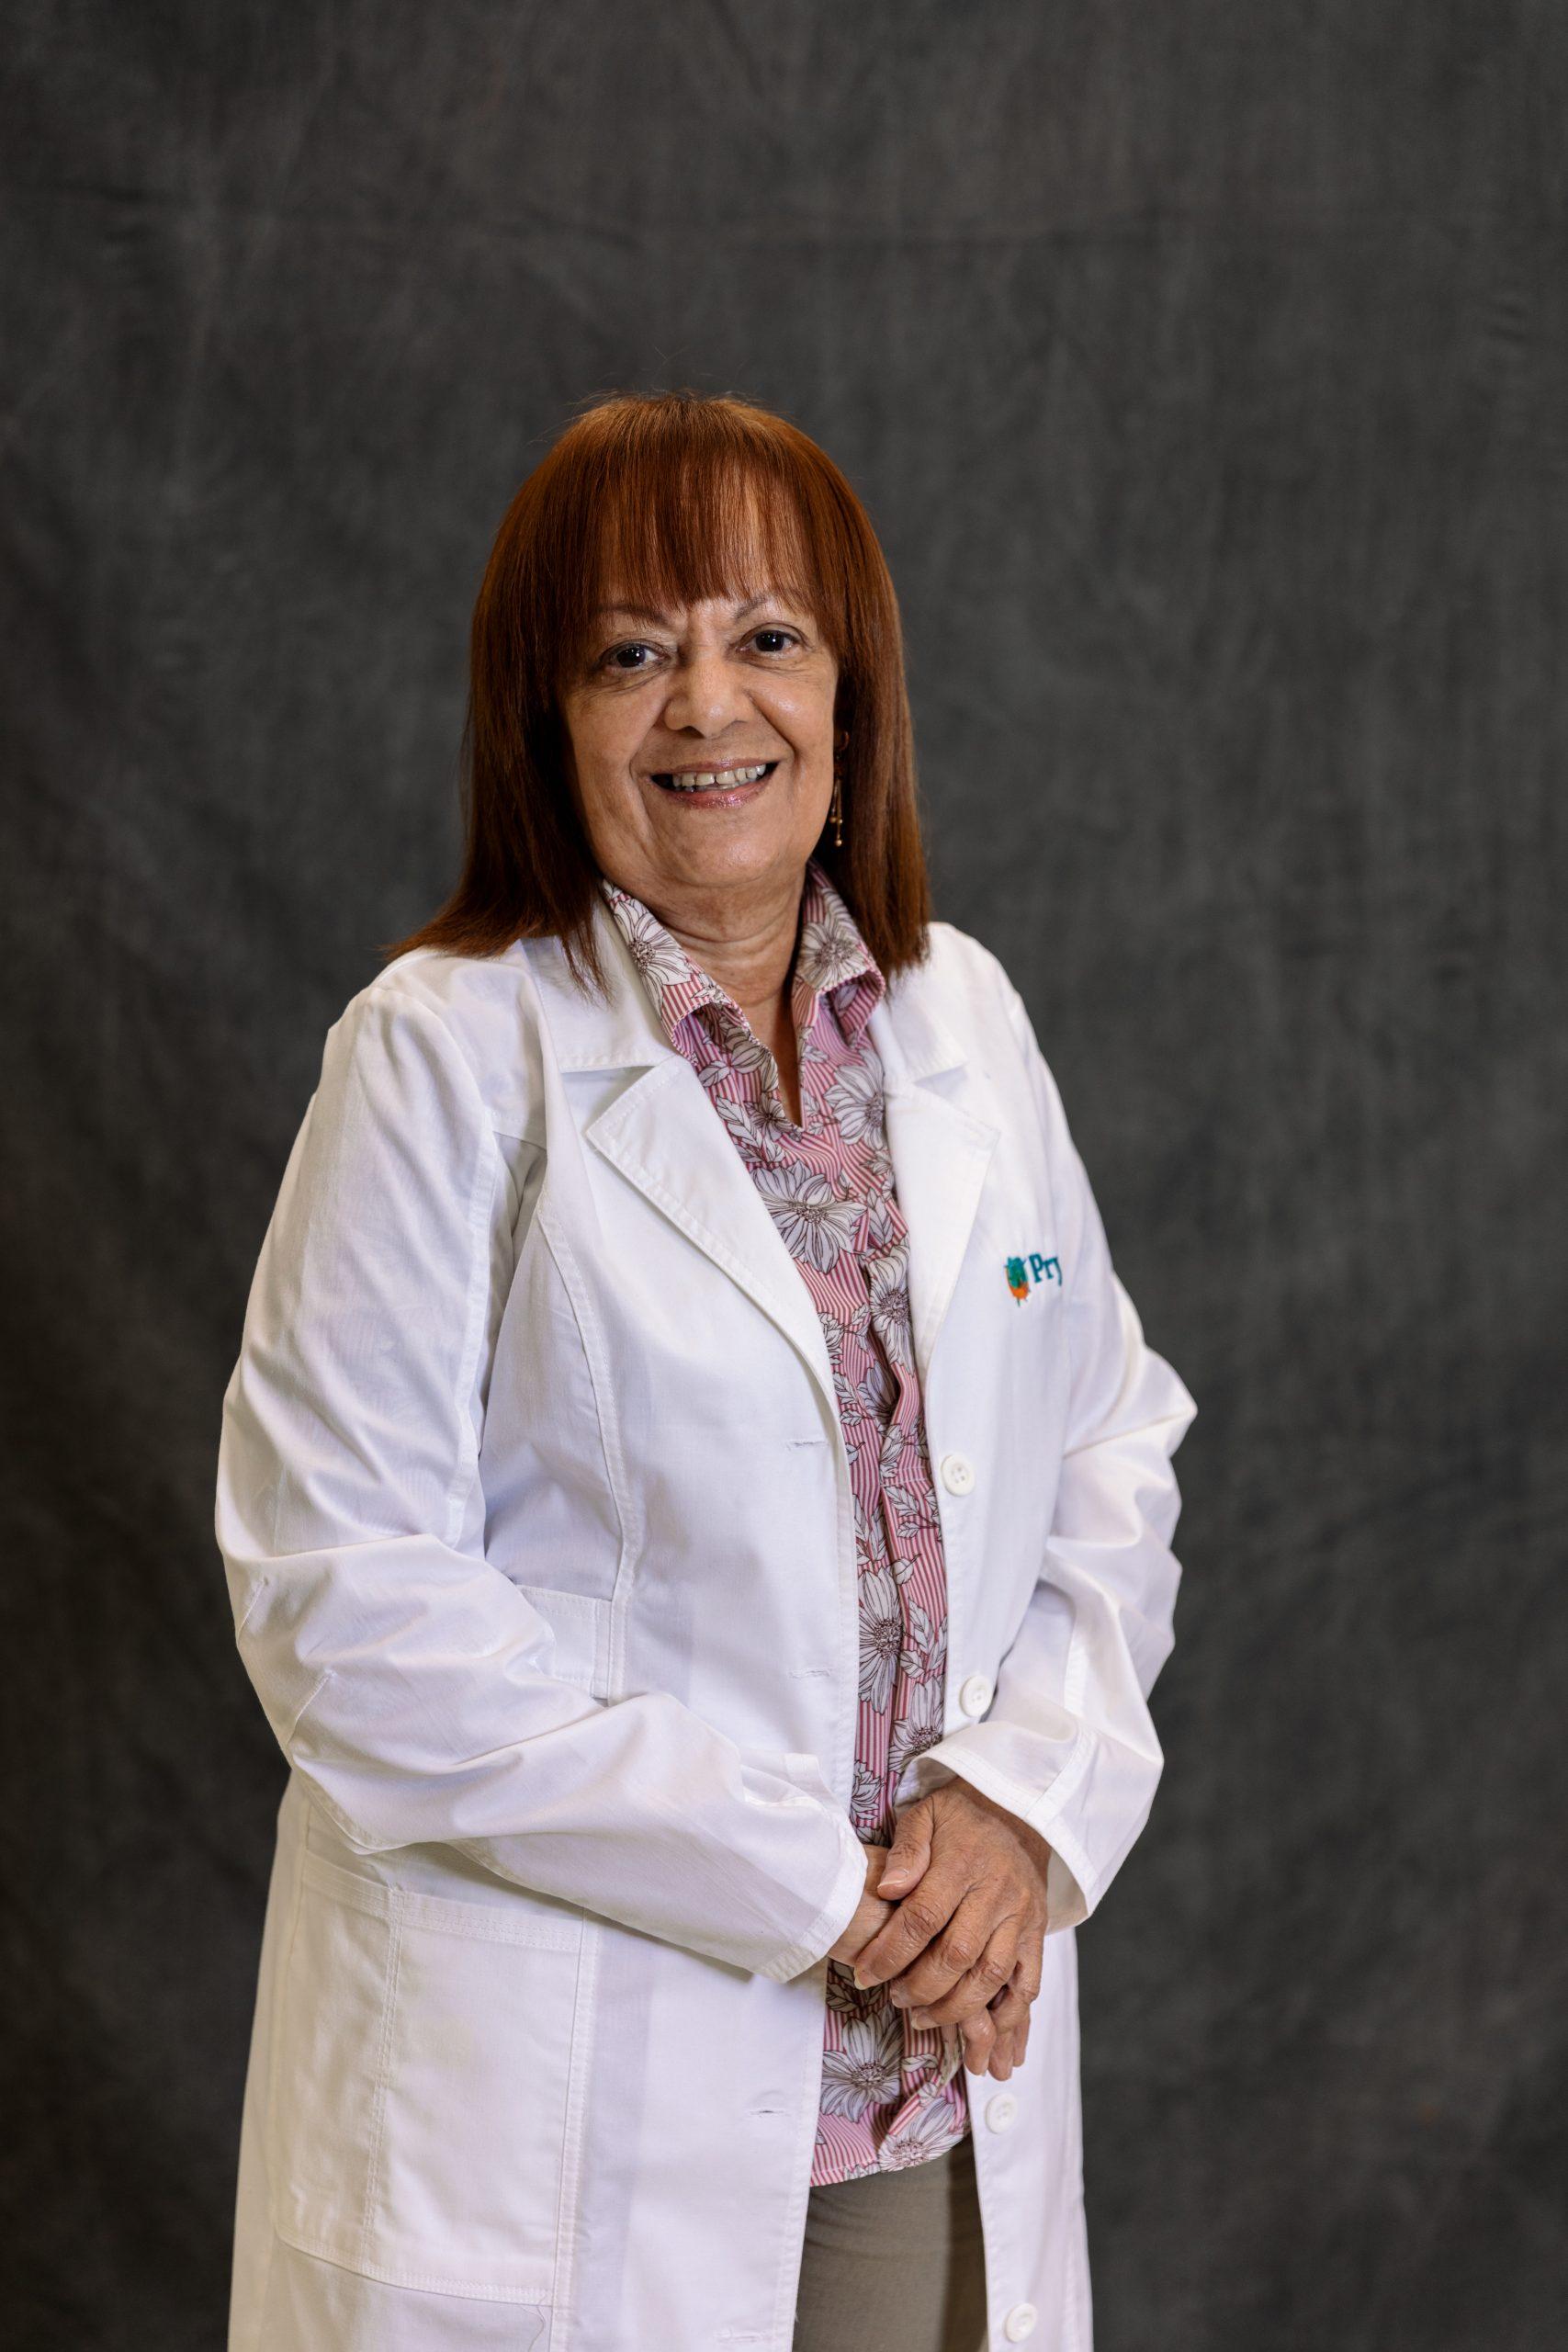 Dra. Livia Ramirez